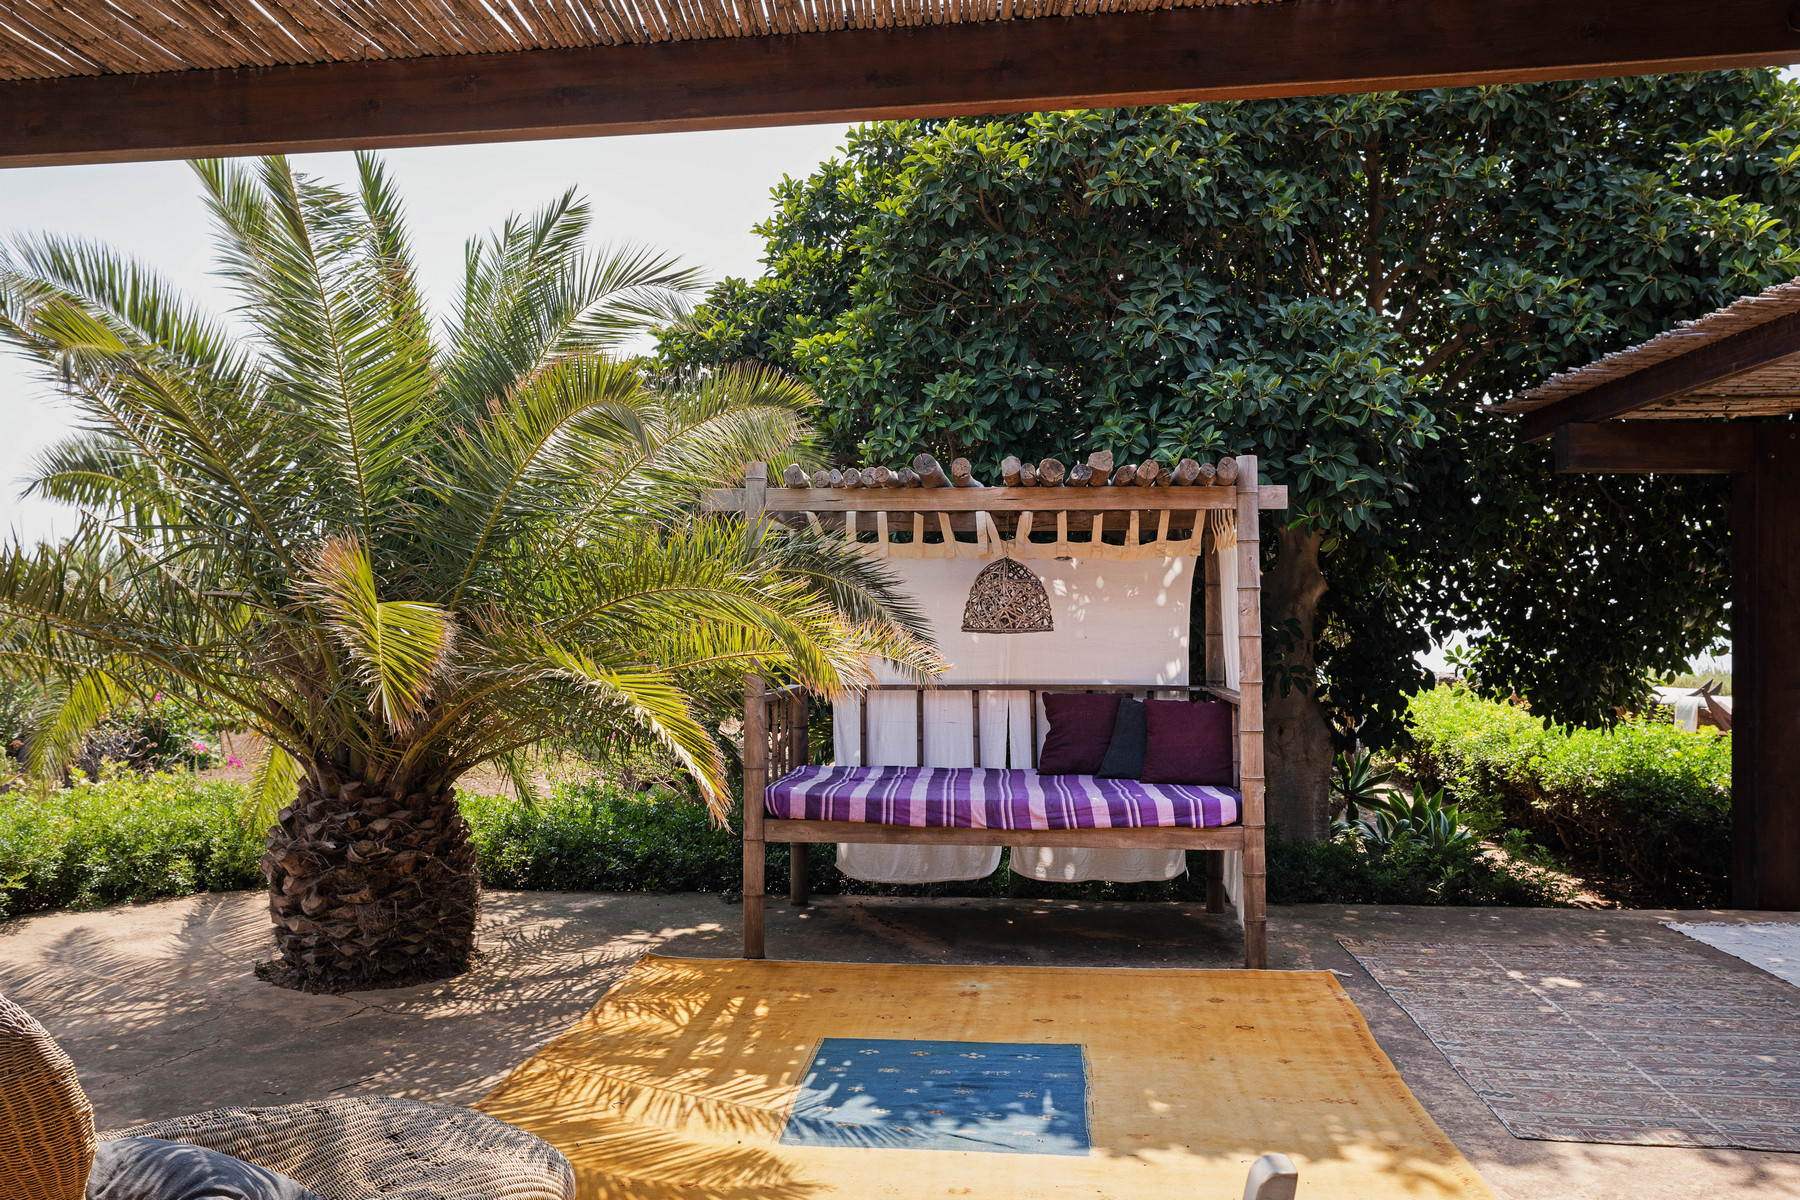 Villa in Vendita a Pantelleria: 5 locali, 82 mq - Foto 10